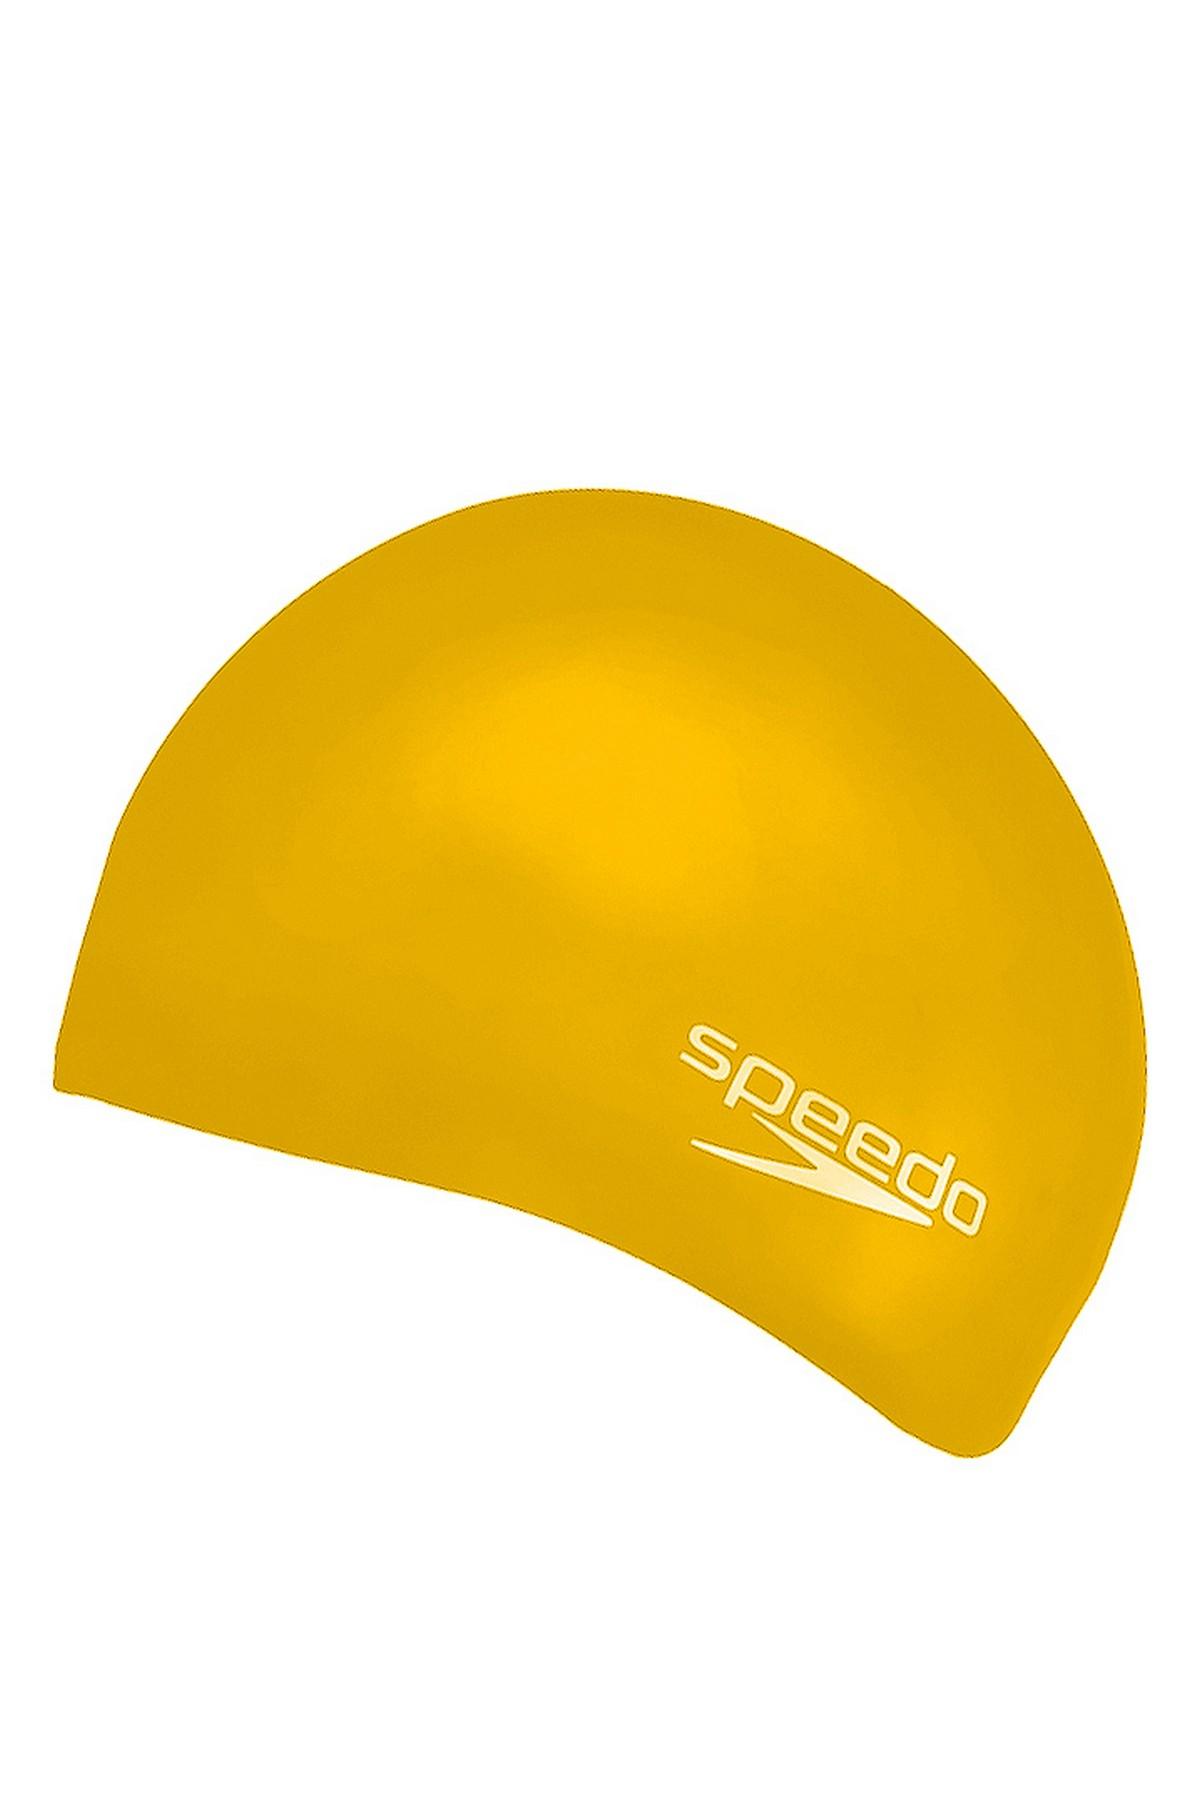 Speedo 8-709906526-SARI